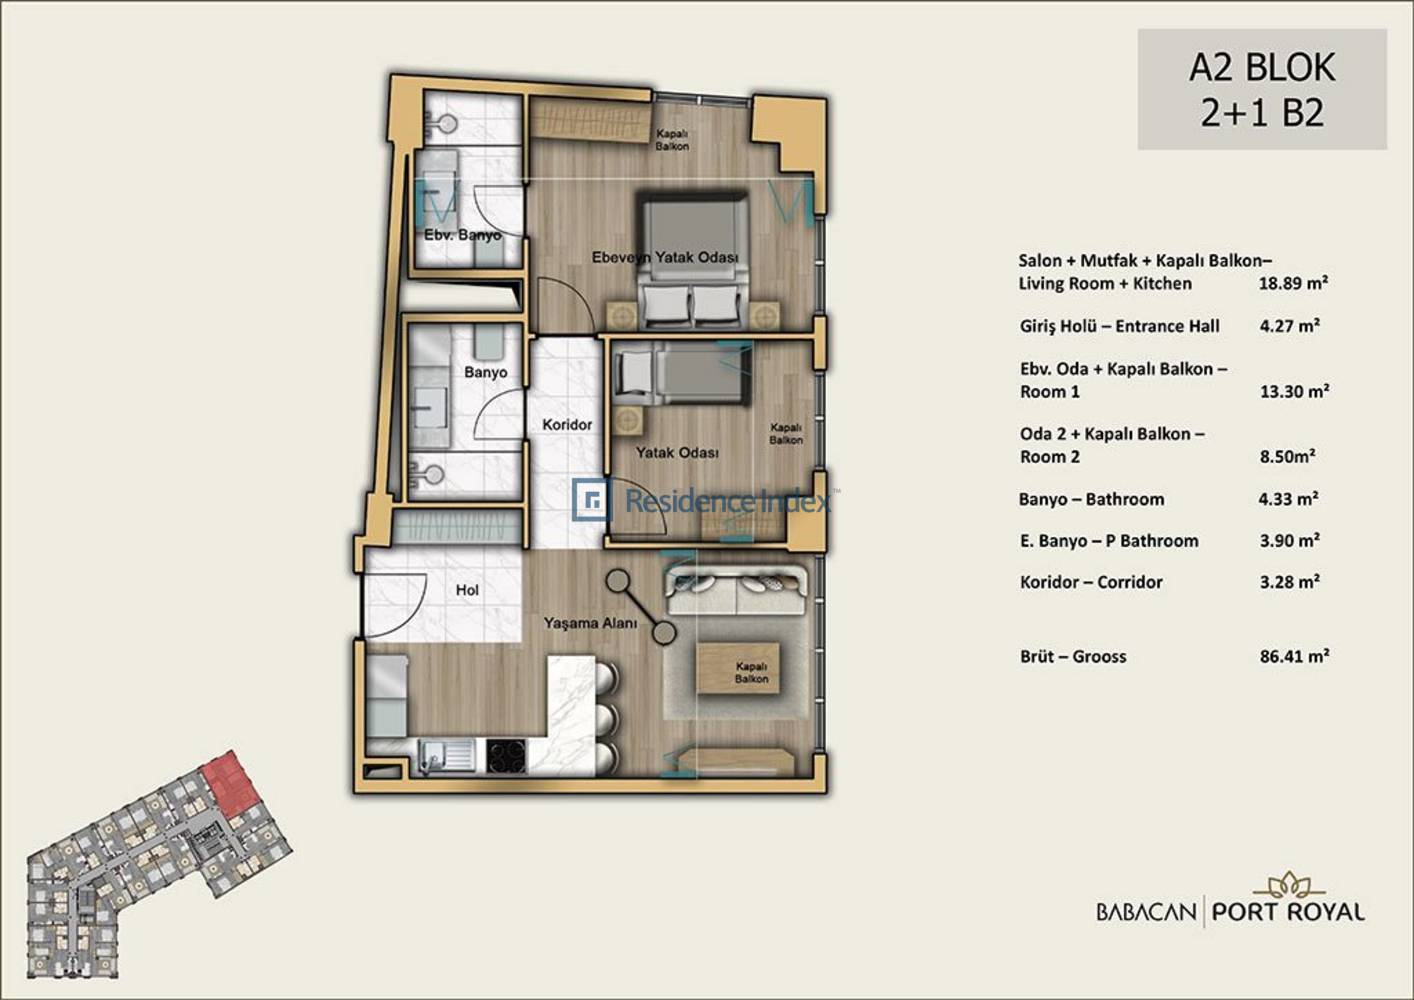 Babacan Port Royal A2-B2